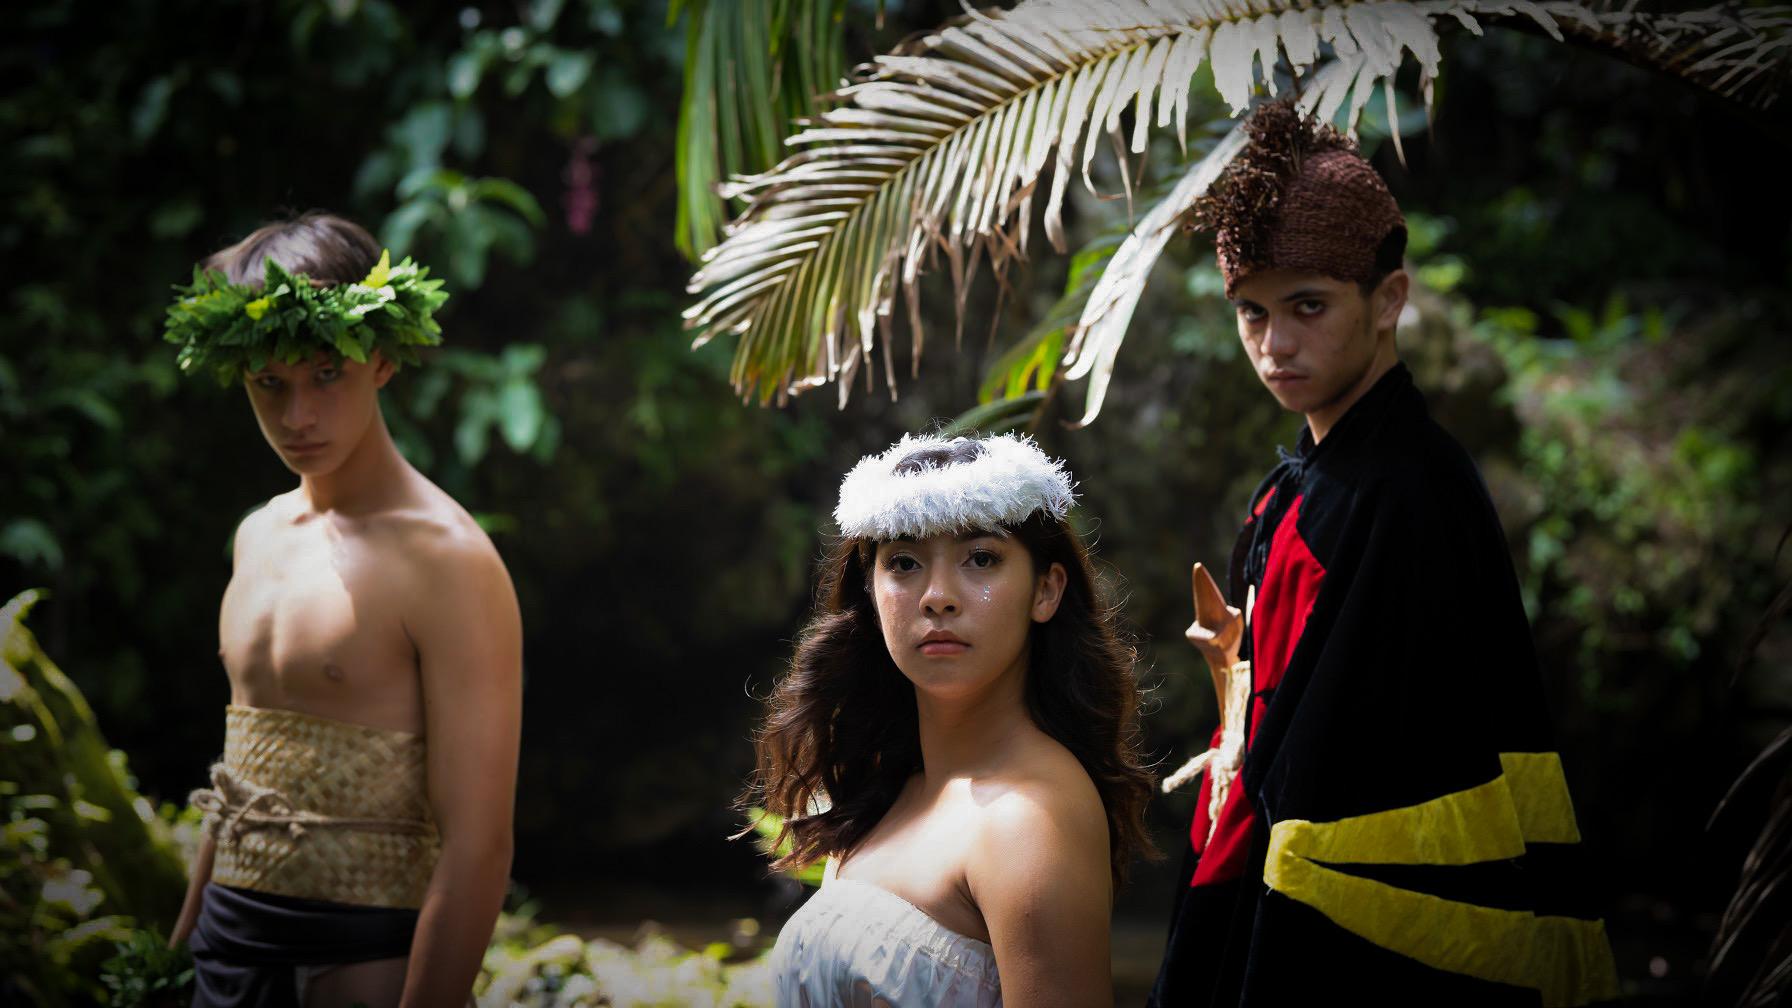 Kamehameha Schools Hawaiʻi Students Produce Film to Keep Hōʻike Tradition Alive